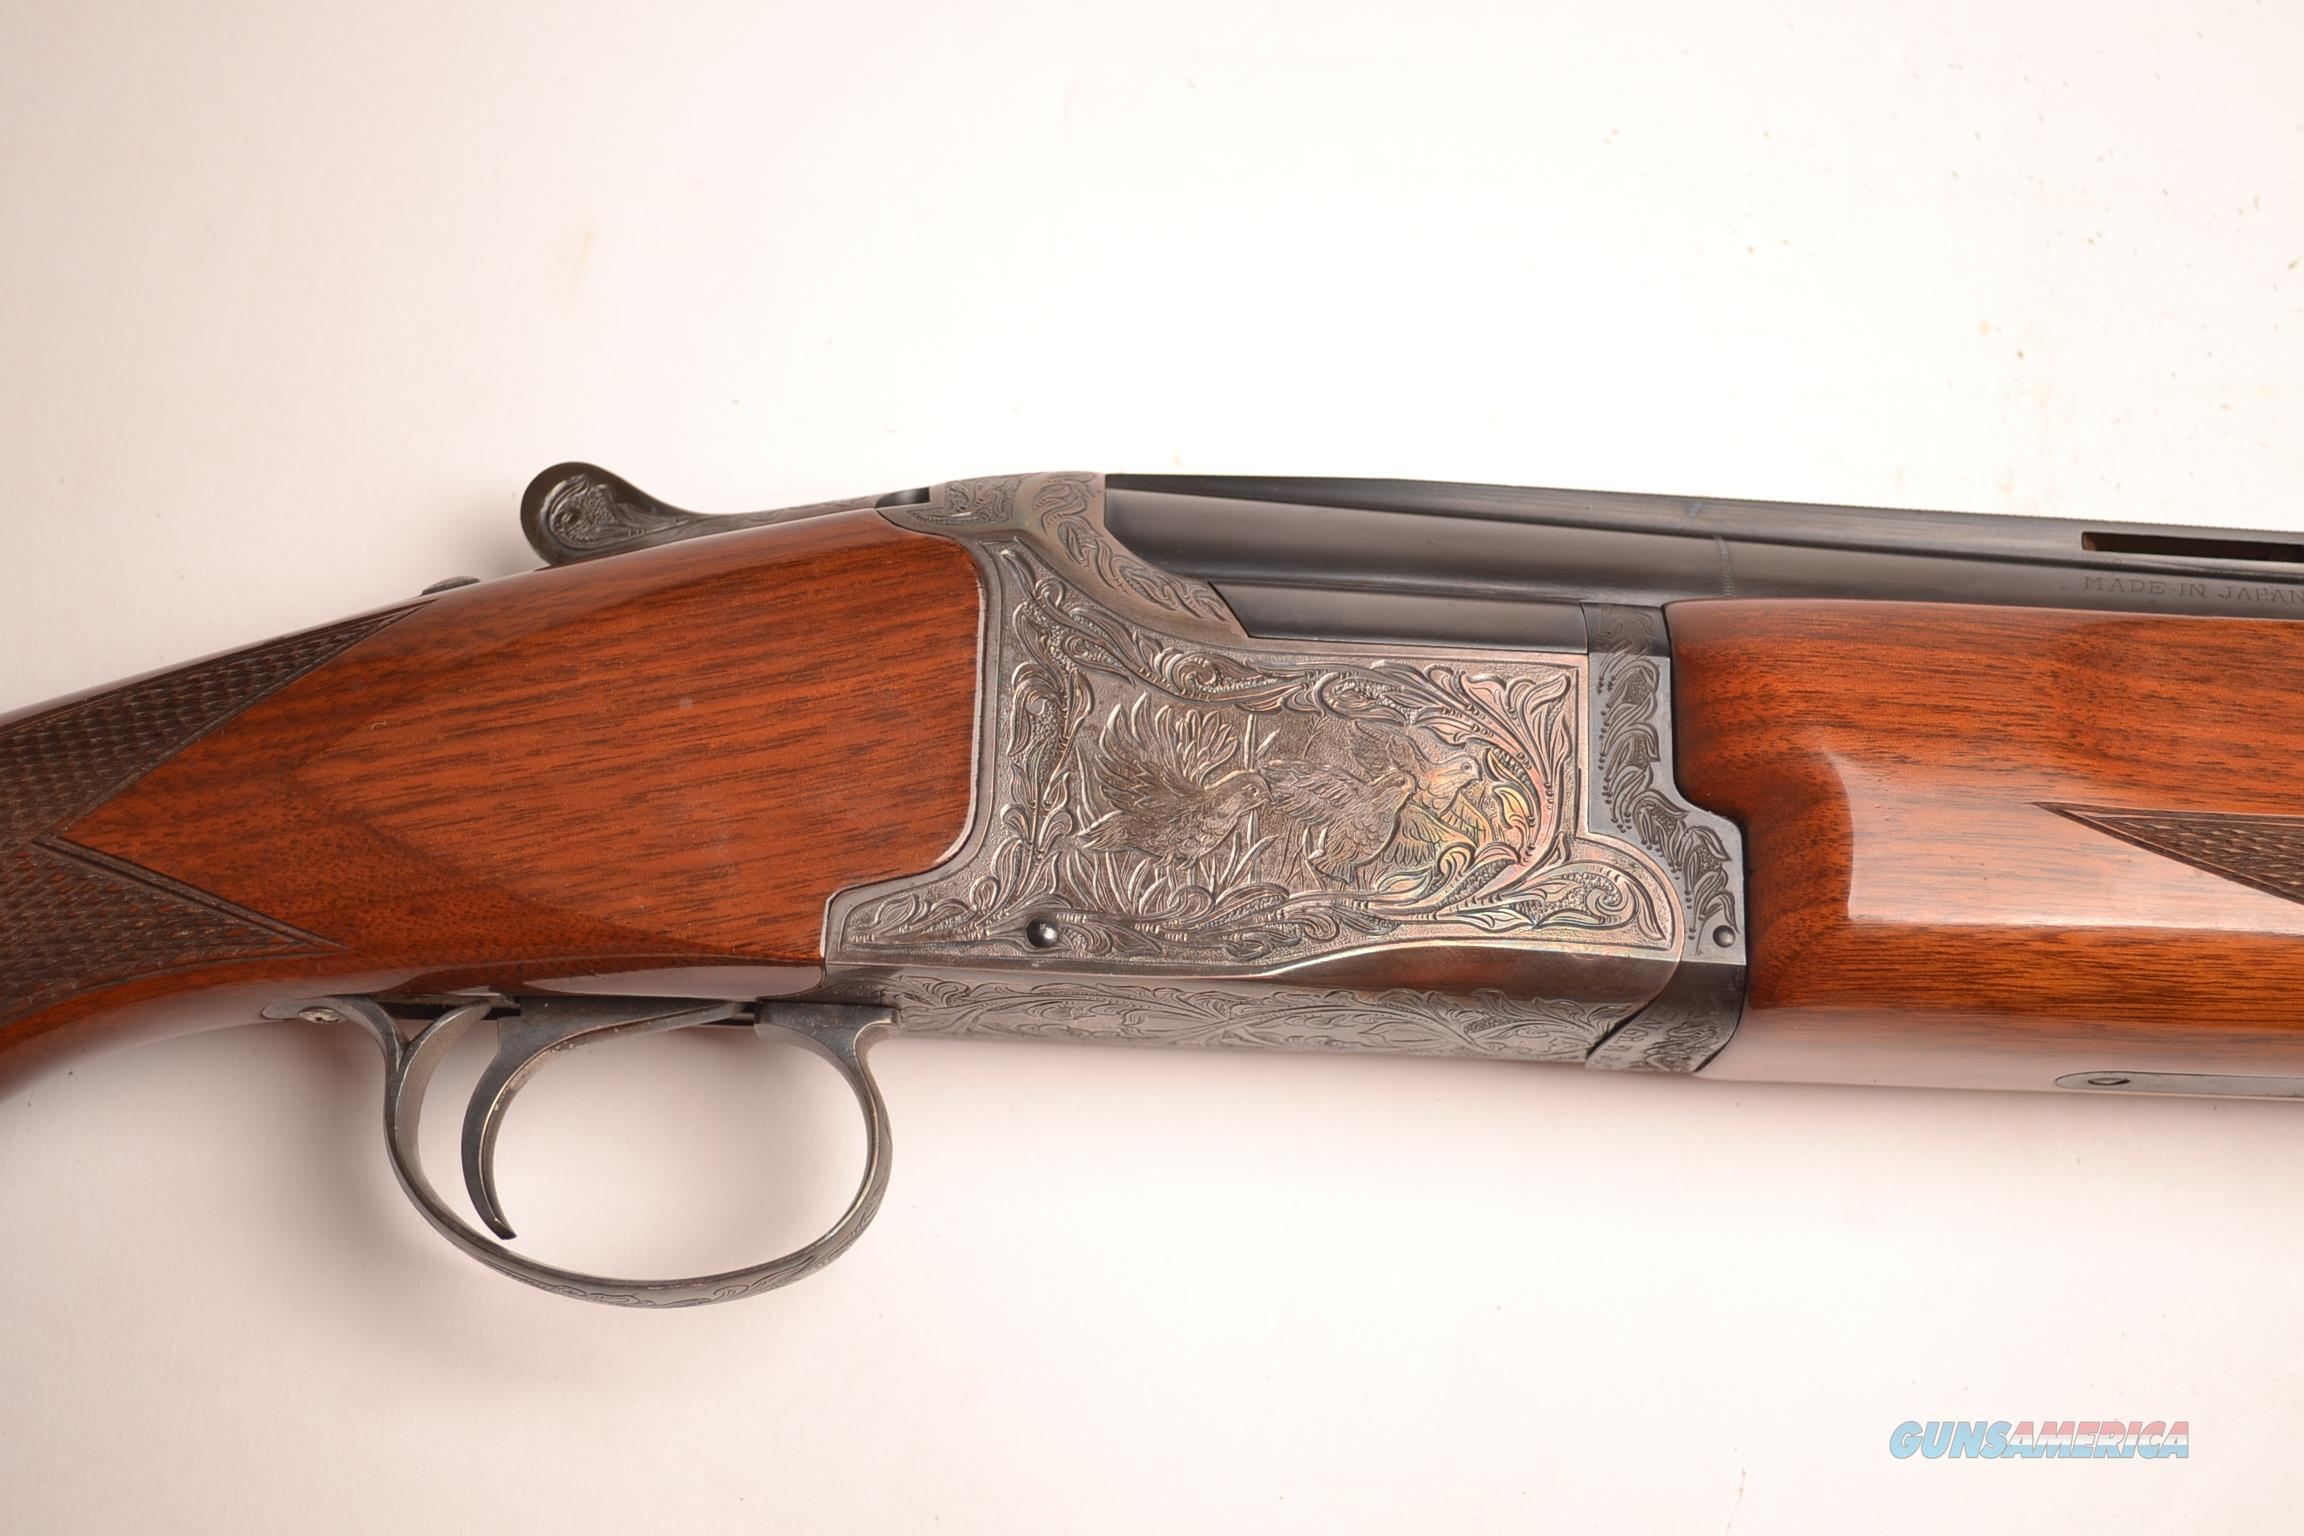 Winchester - Model 96 XTR, 12ga.  Guns > Shotguns > Winchester Shotguns - Modern > O/U > Hunting